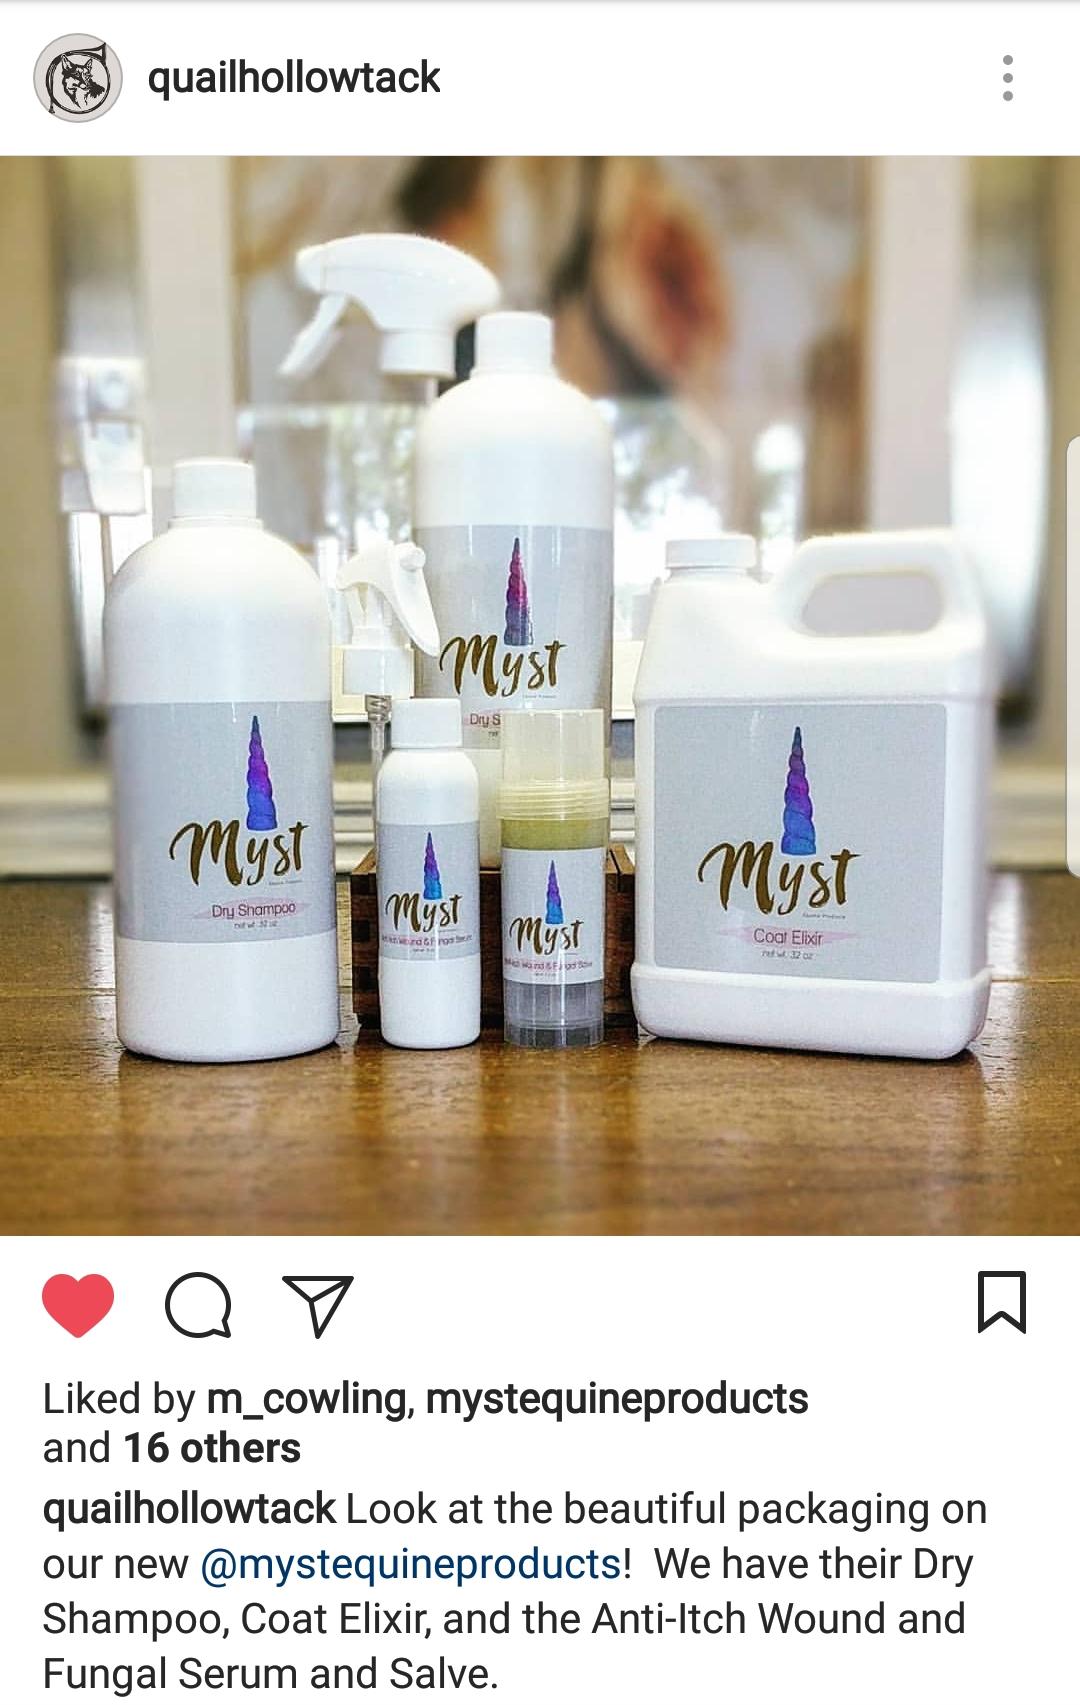 myst equine produts, myst dry shampoo